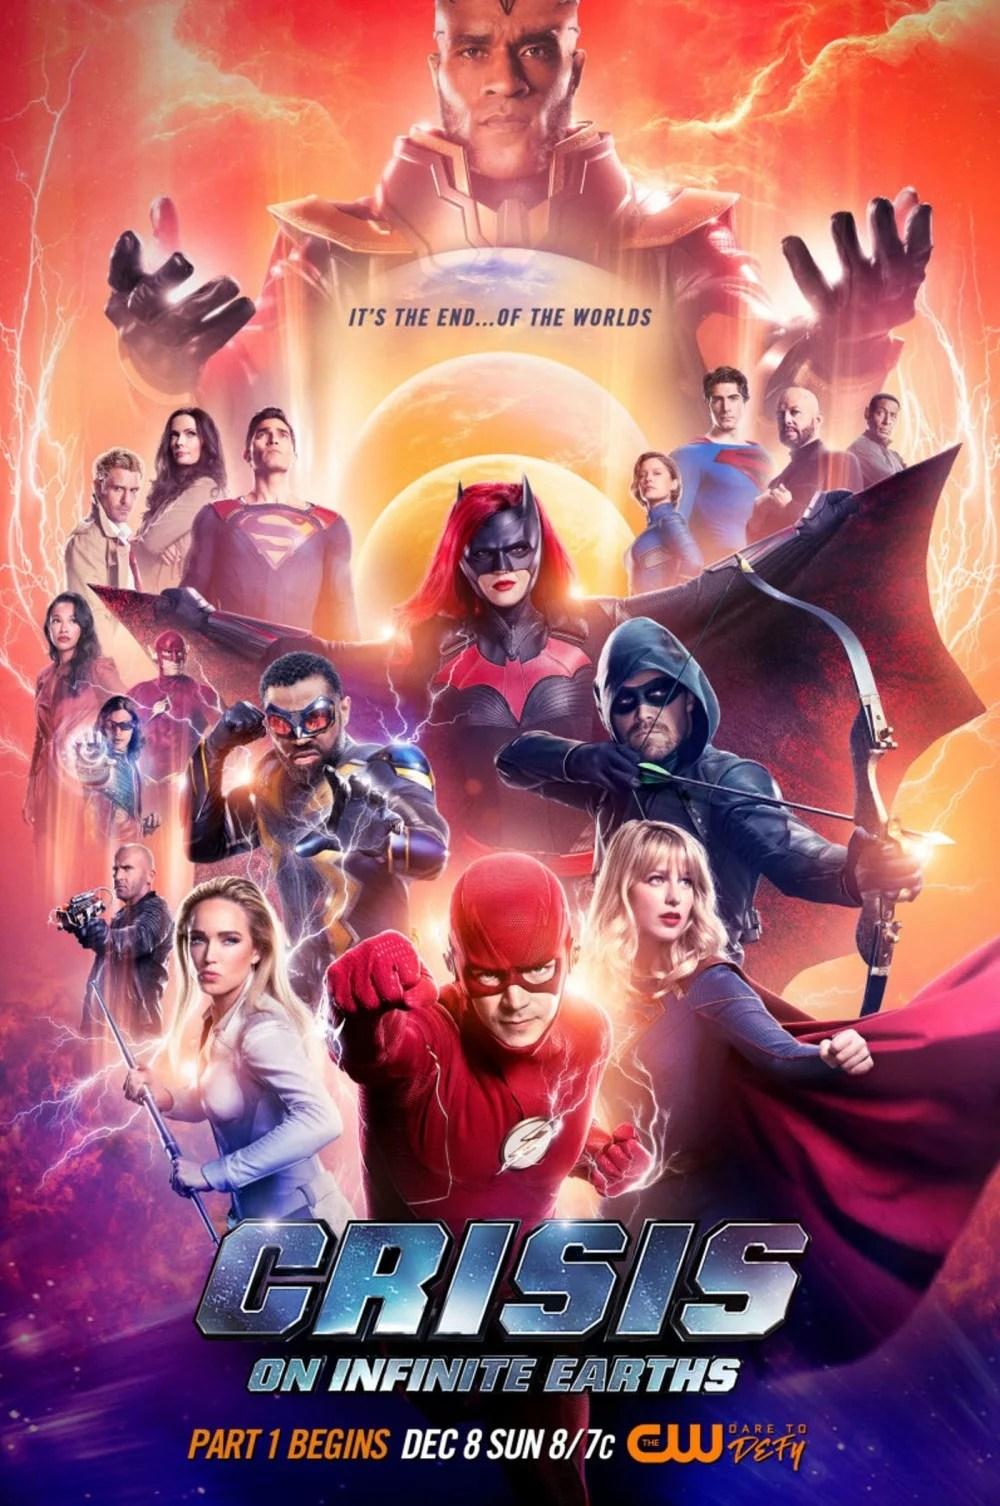 【《Crisis on Infinite Earths》聯動】完全版的DC「正義聯盟」!《Crisis on Infinite Earths》成本年最有看頭電視劇 ...